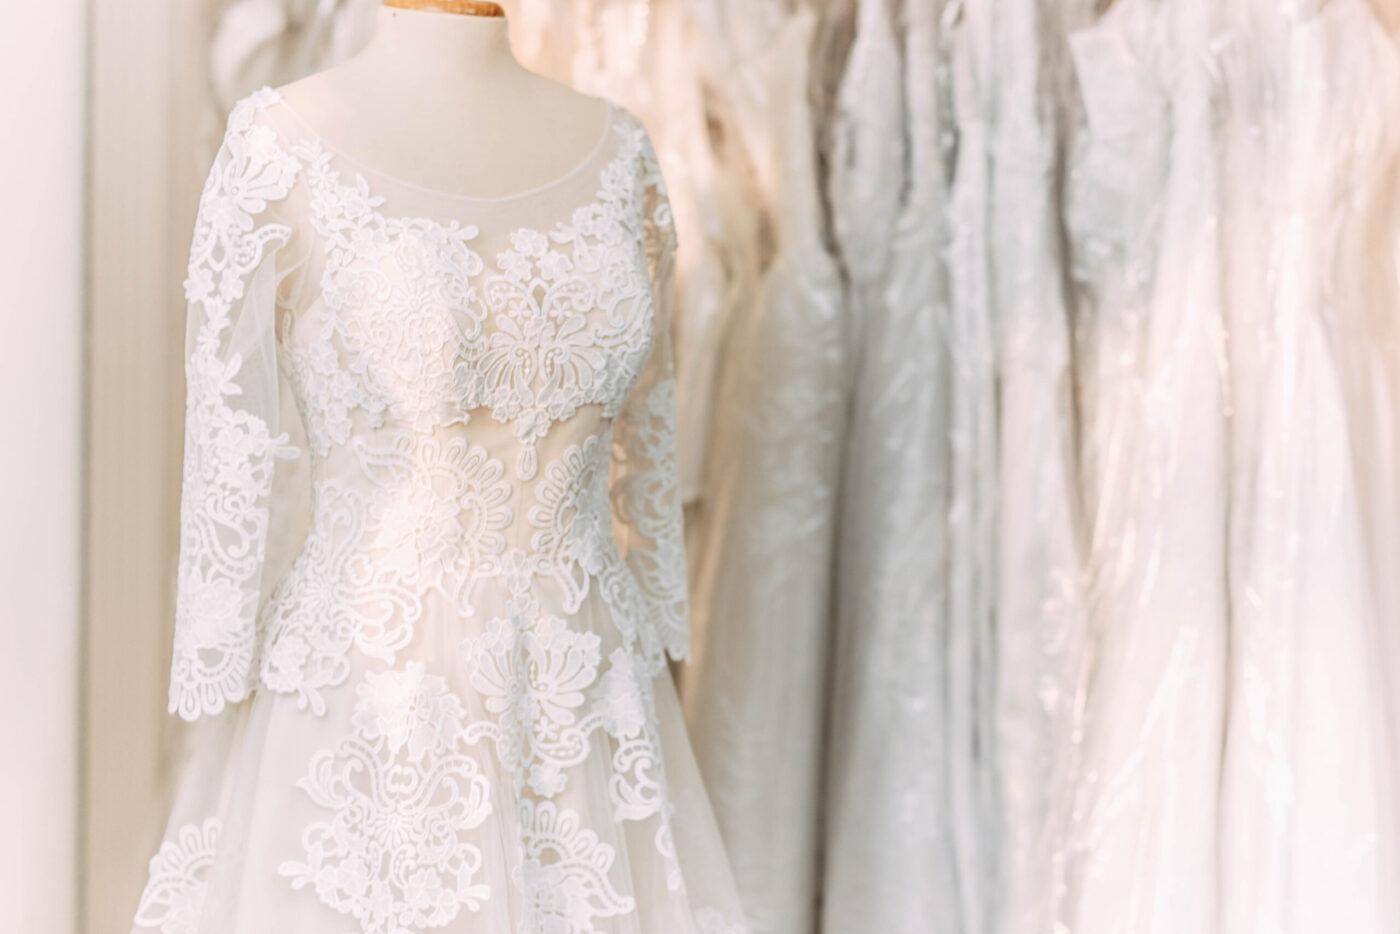 bridal gown on hanger